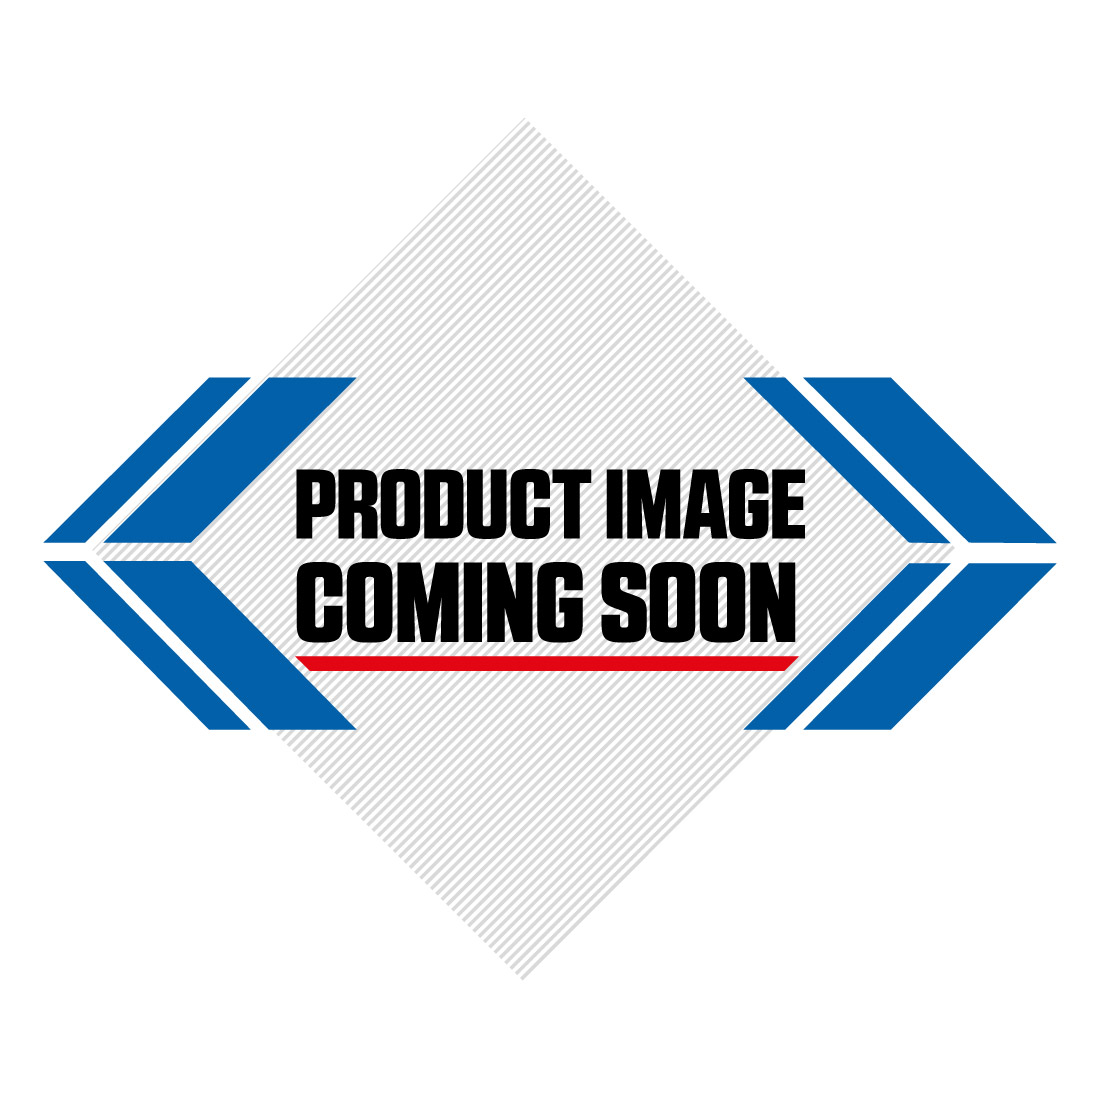 Suzuki Plastic Kit RMZ 450 (08-17) White Image-5>